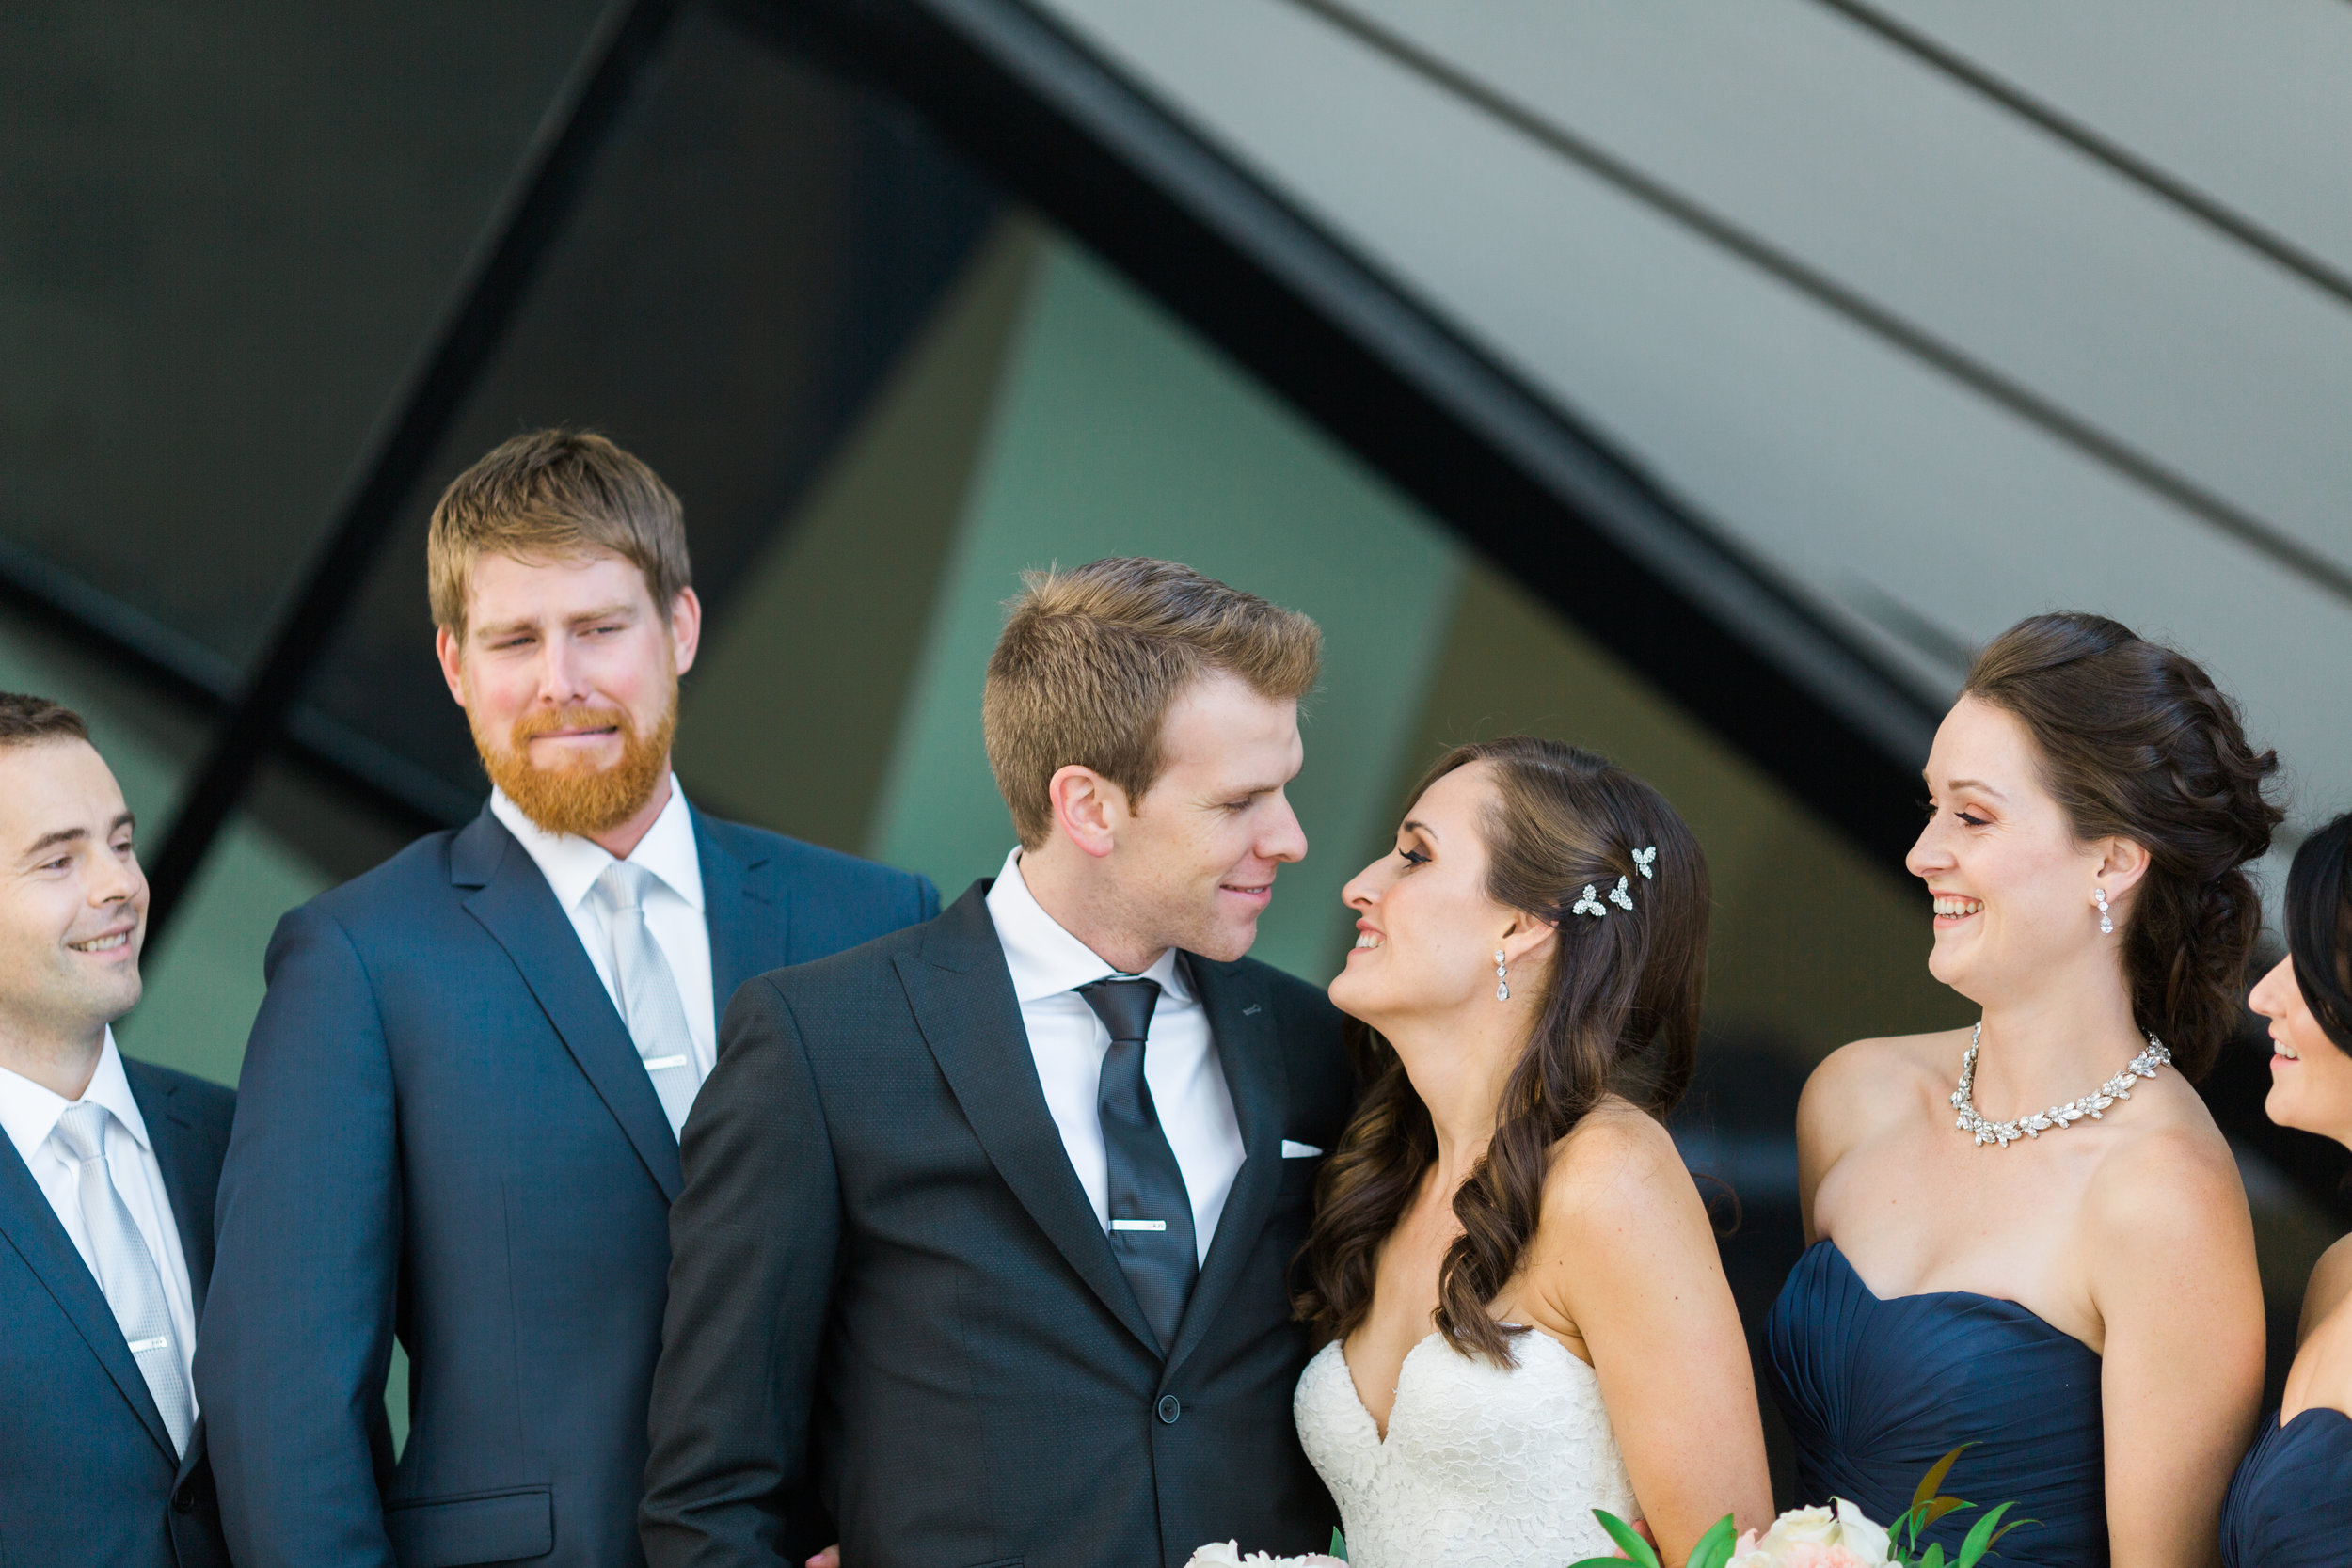 Toronto Fine Art Photographer - Yorkville Wedding - Bridal Party Portraits-57.jpg